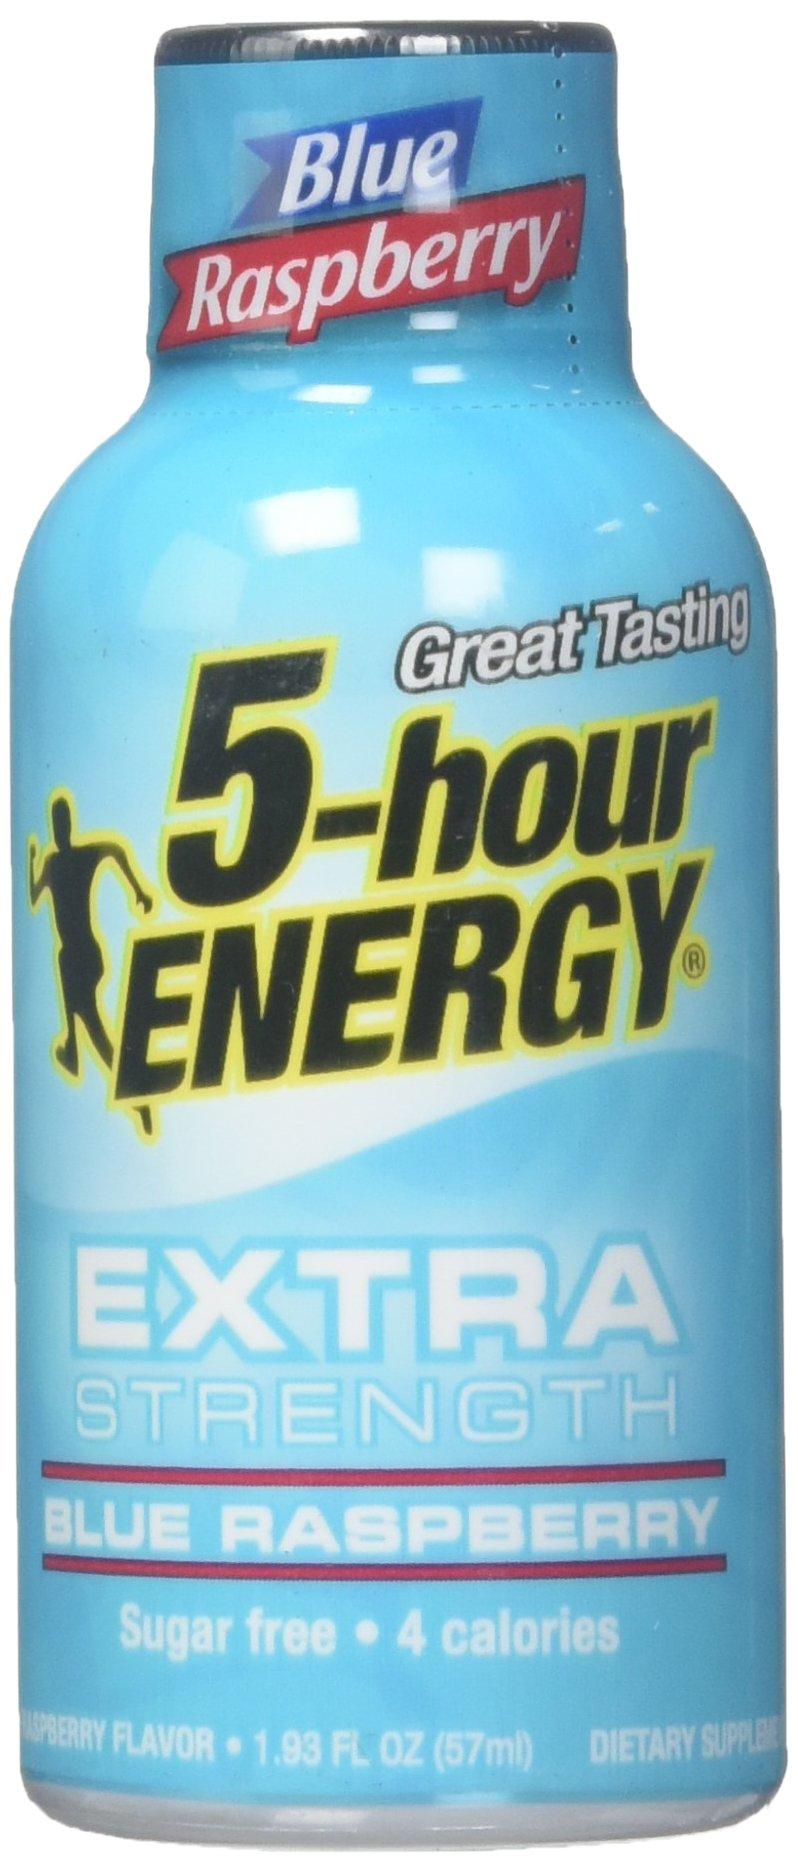 5 Hour Energy Extra Strength Blue Raspberry - Pack of 6